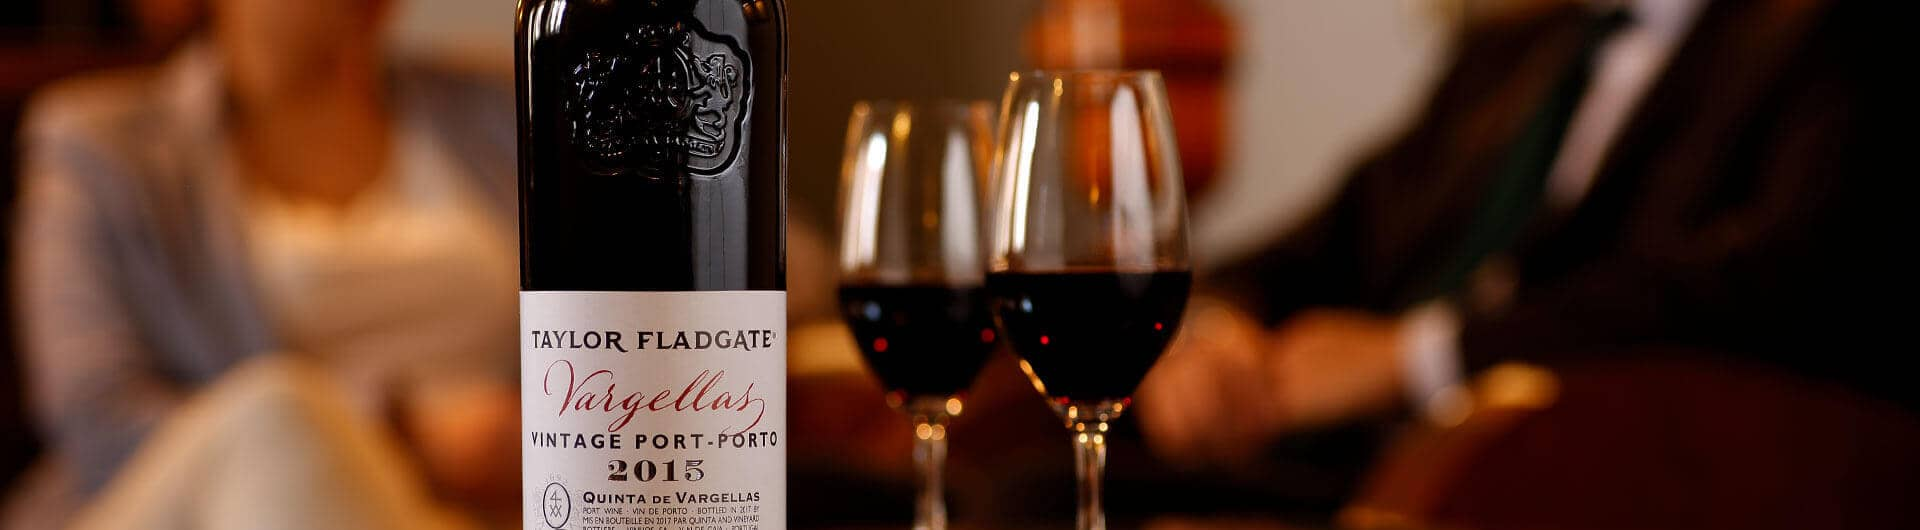 Quinta de Vargellas 2015 Vintage Port Wine bottle